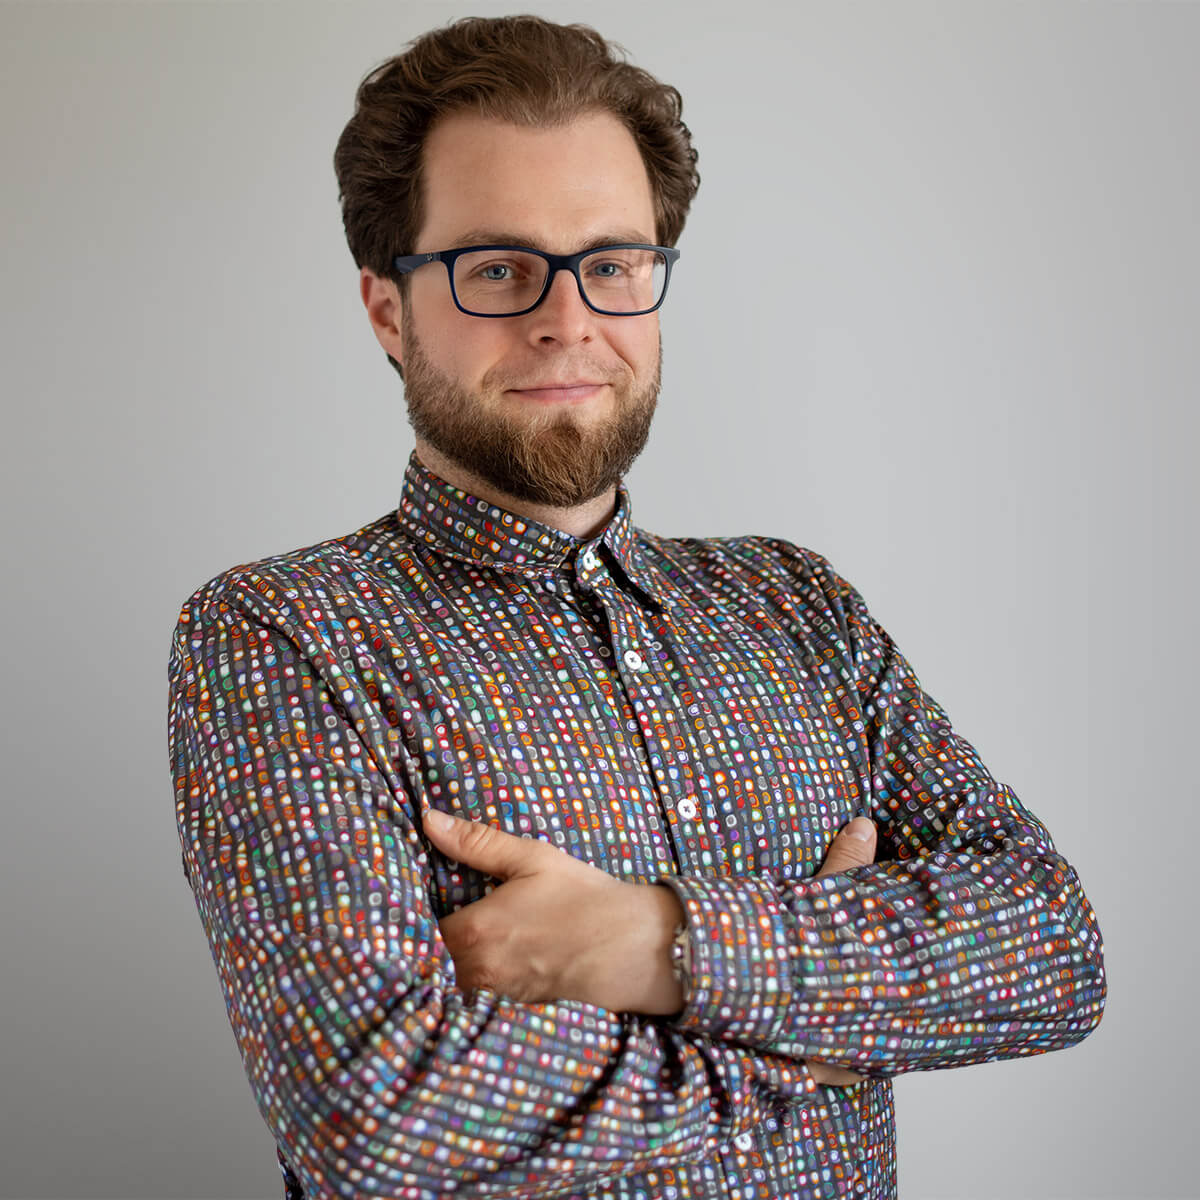 Maciek Albigowski